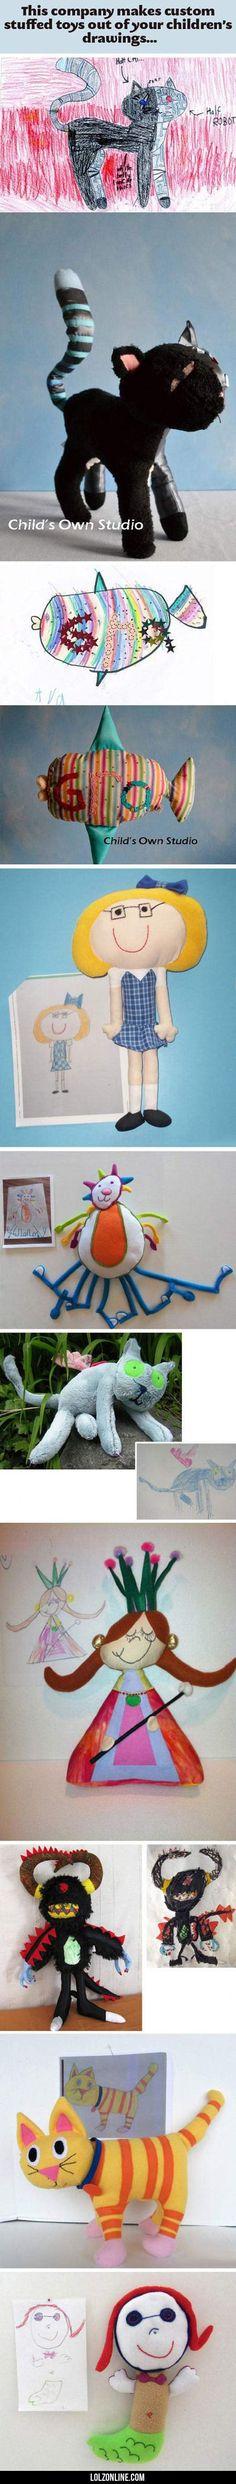 This Company Makes Custom Stuffed Toys#funny #lol #lolzonline